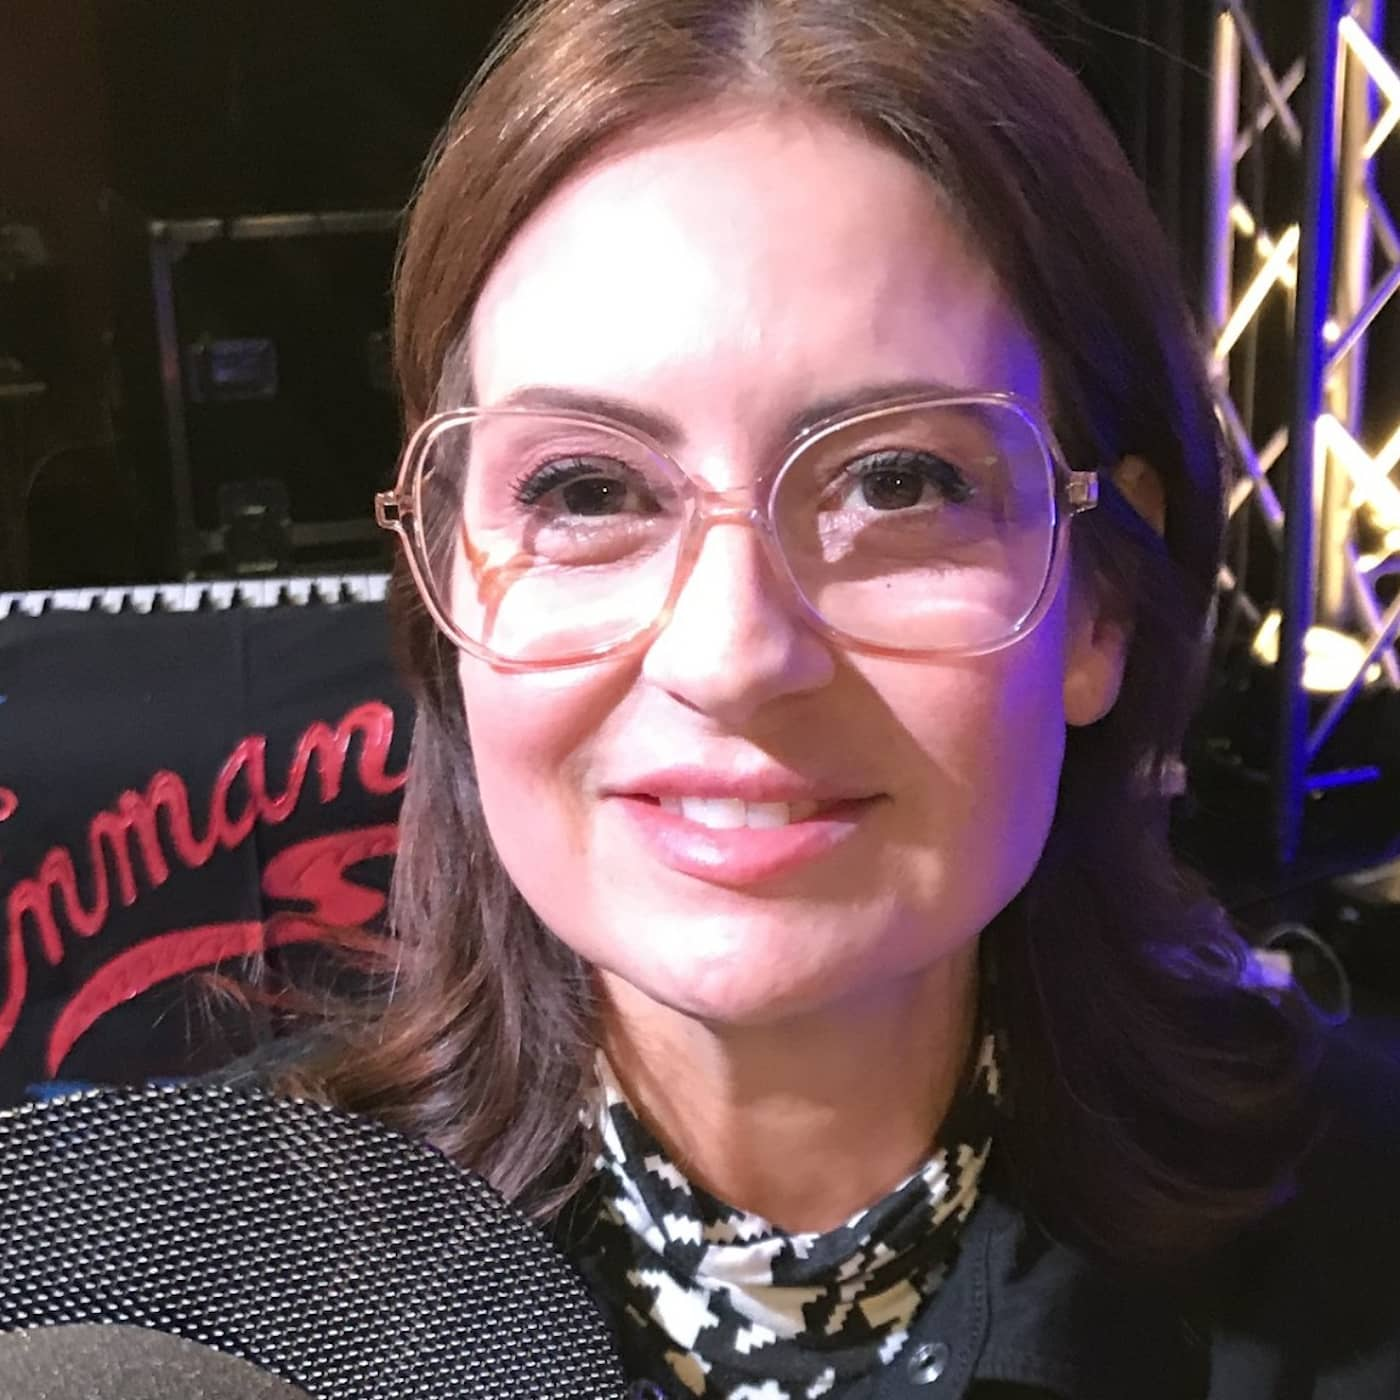 Susanna Dzamic testar räkskalsparfym